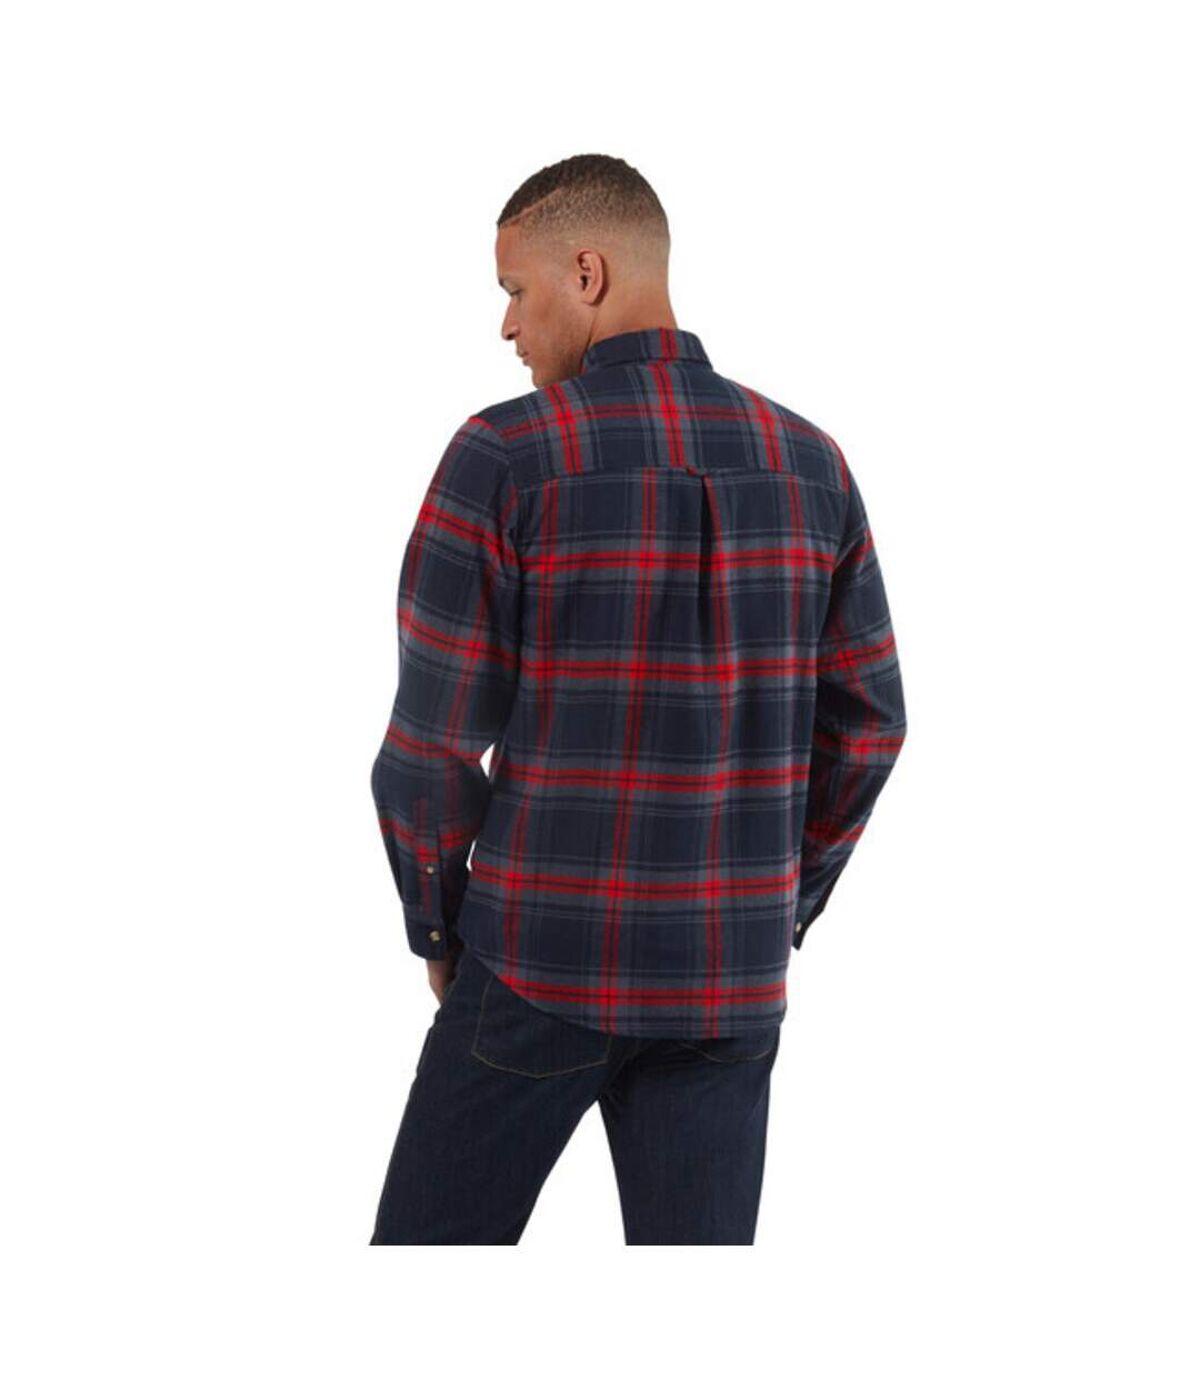 Craghoppers Mens Wilmot Checked Long-Sleeved Shirt (Navy) - UTCG1475